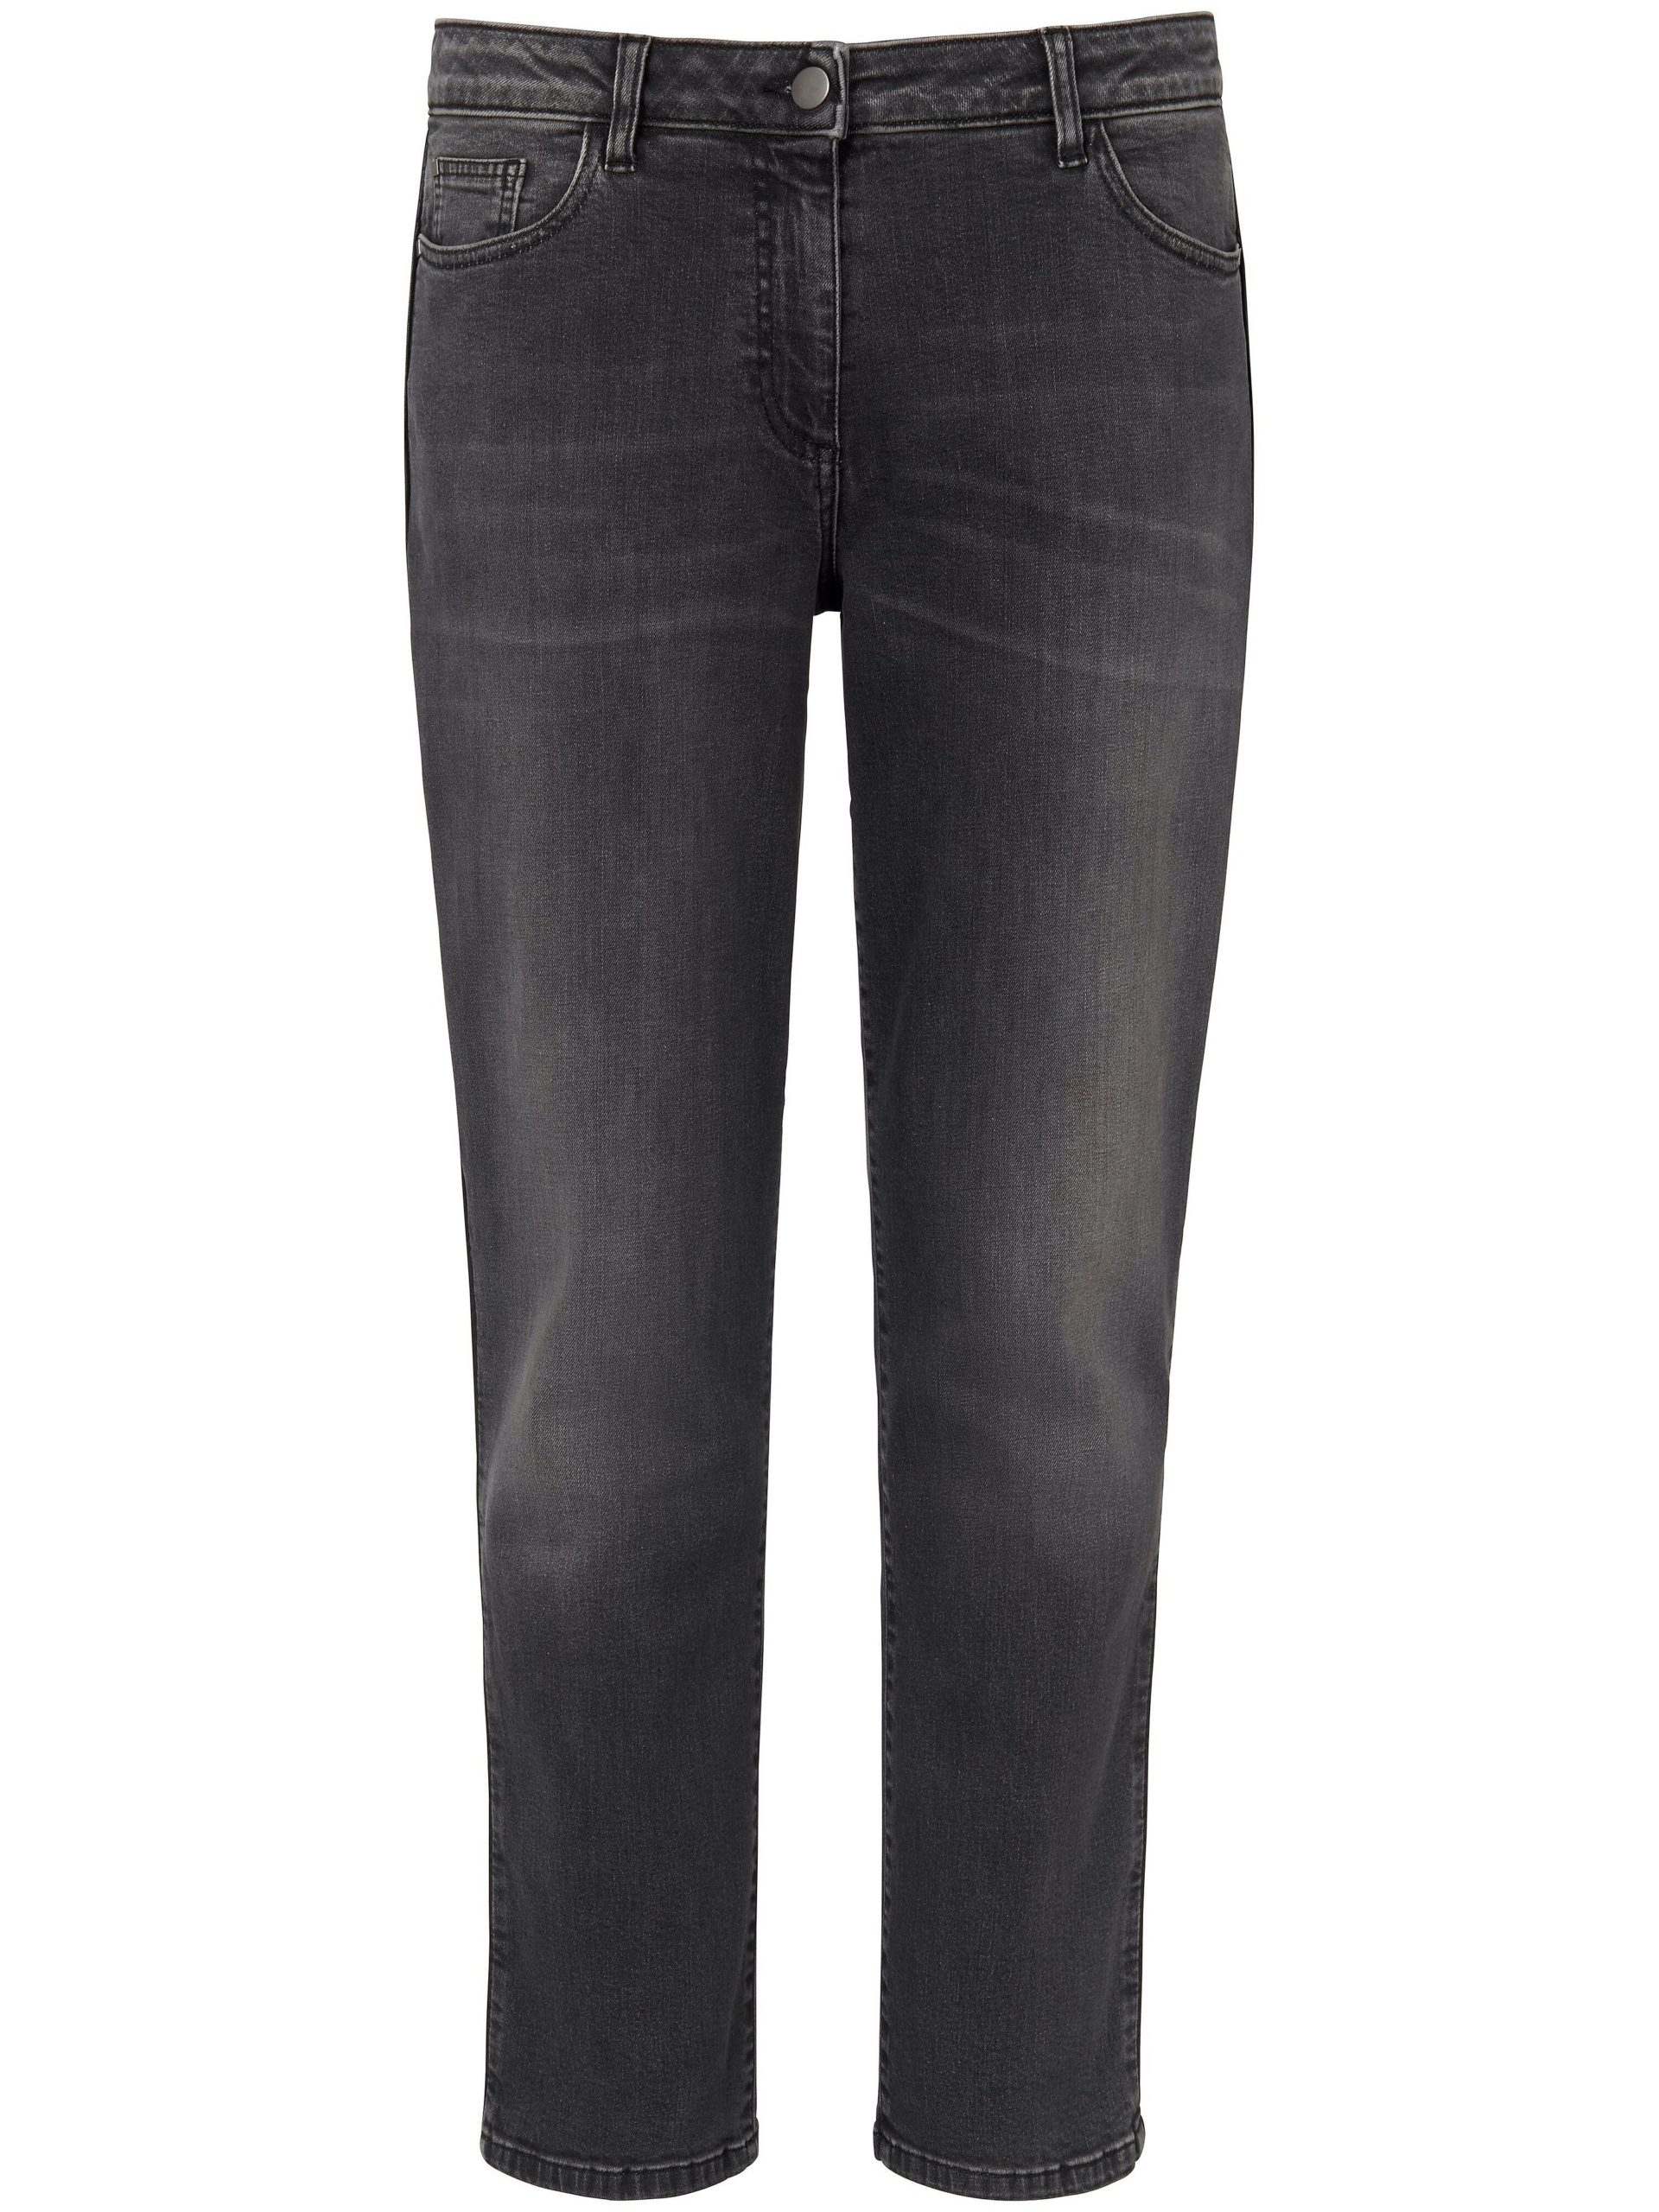 7/8-jeans Van Persona by Marina Rinaldi grijs Kopen